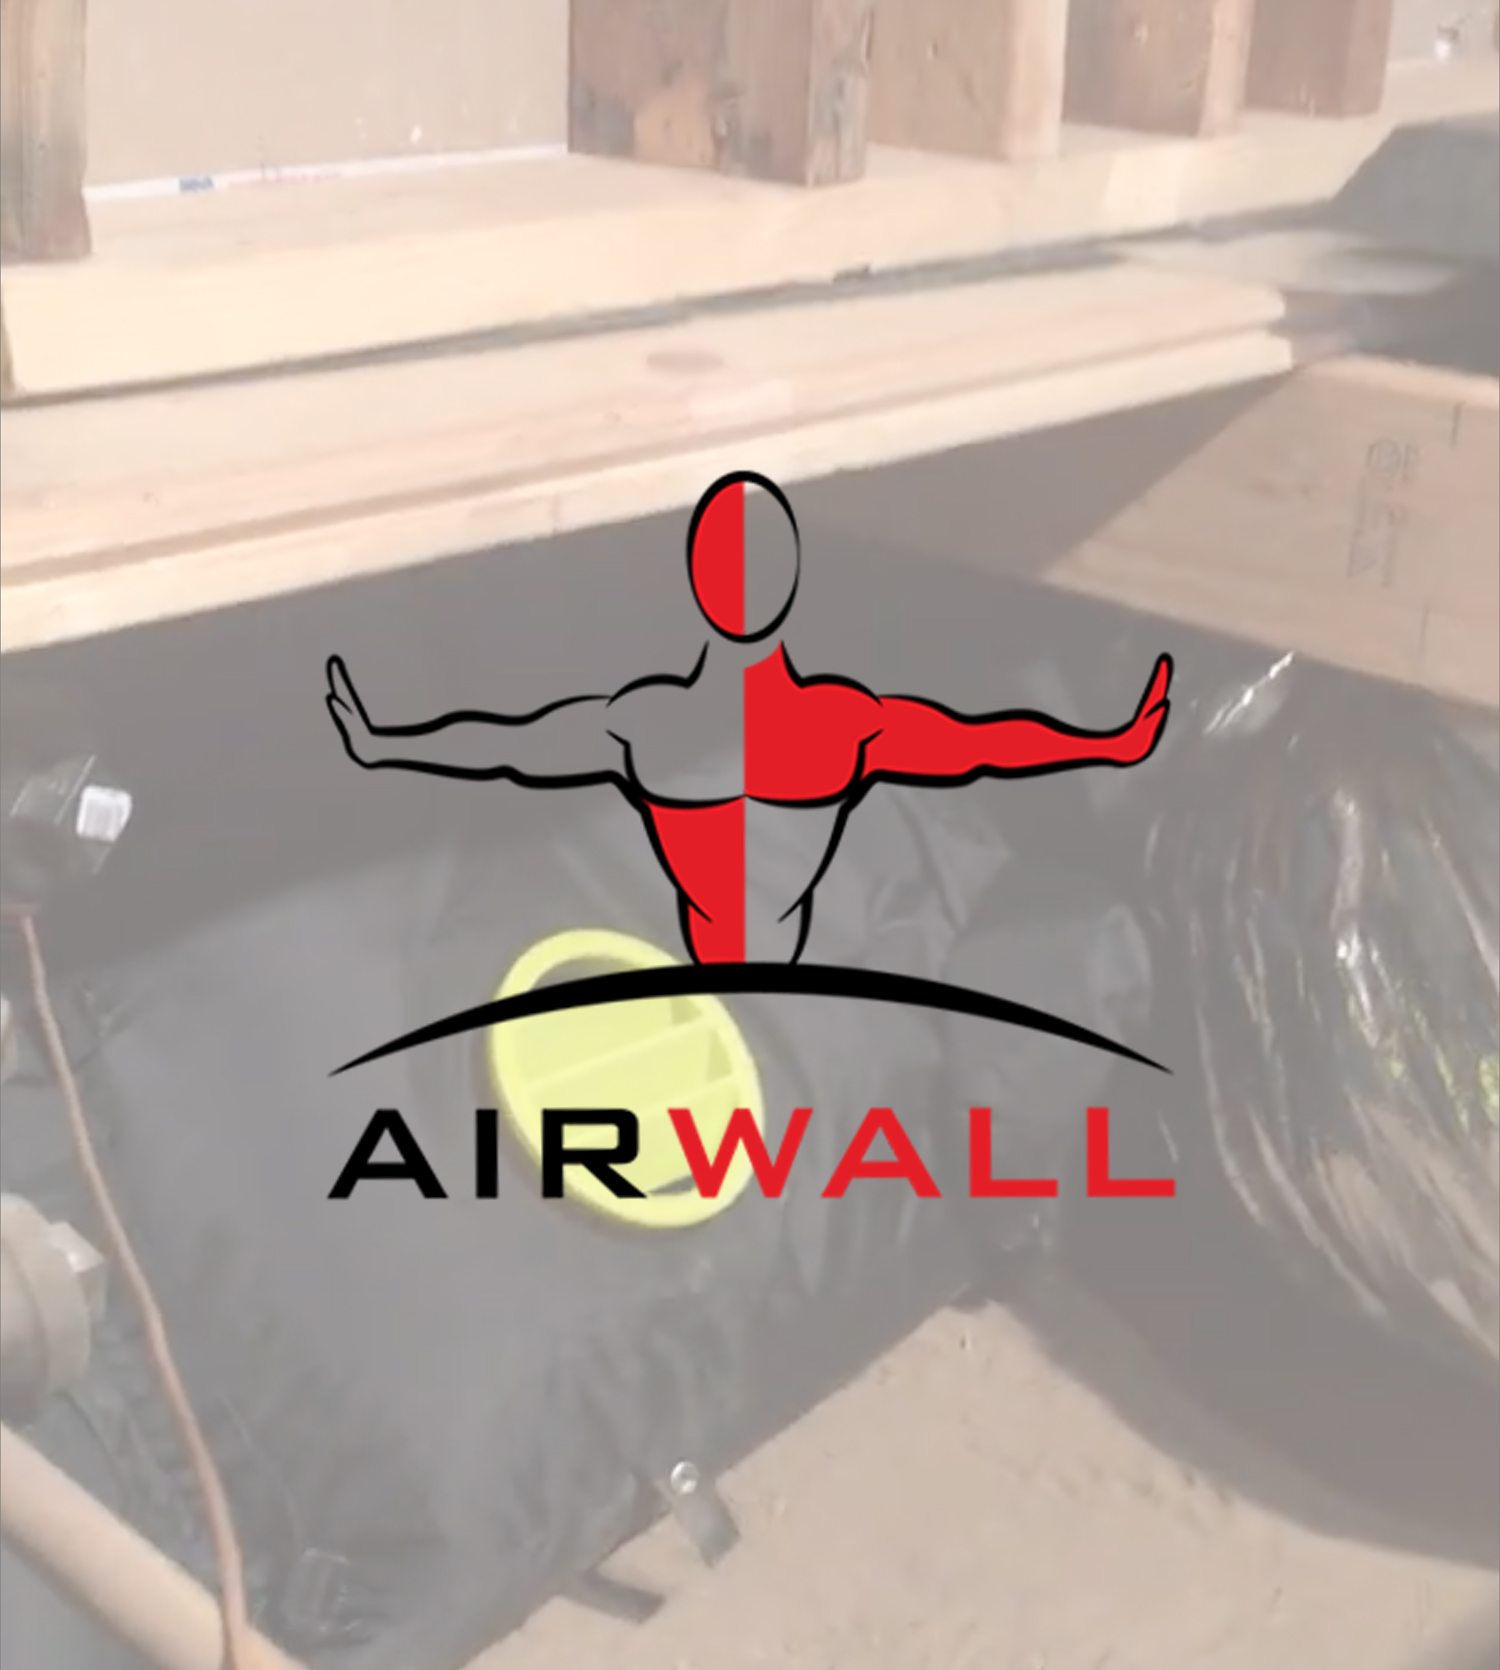 AIRWALL in a Crawlspace